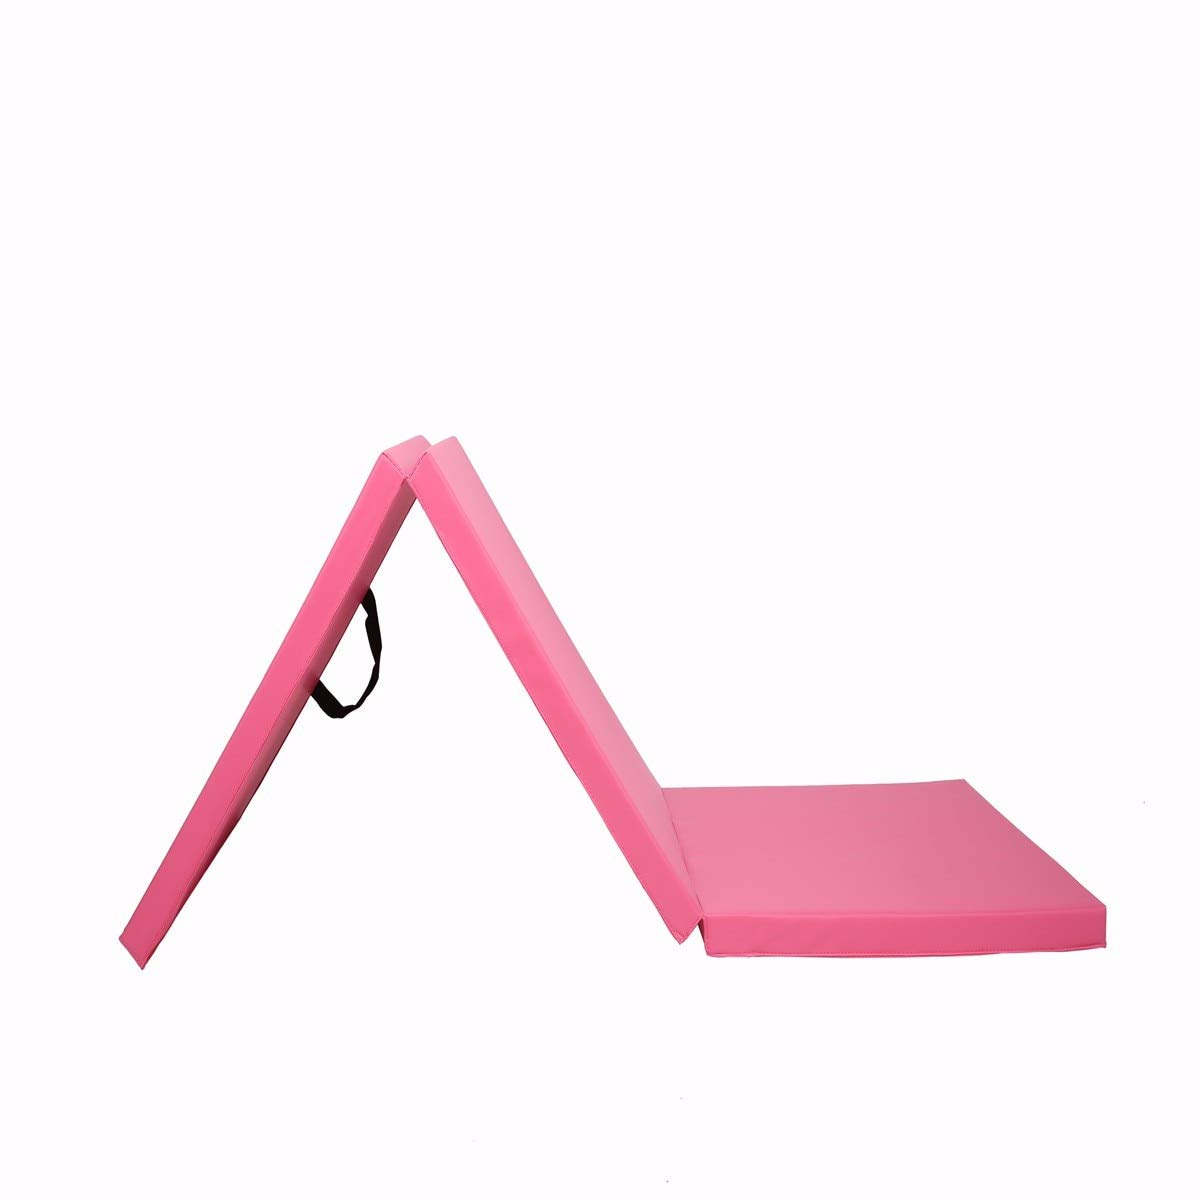 YOOMAT Yoga-Matte Männer und Frauen Fitness Yoga-Matte Falten Praxis Yoga-Matte Pad Gymnastik für Outdoor-Training